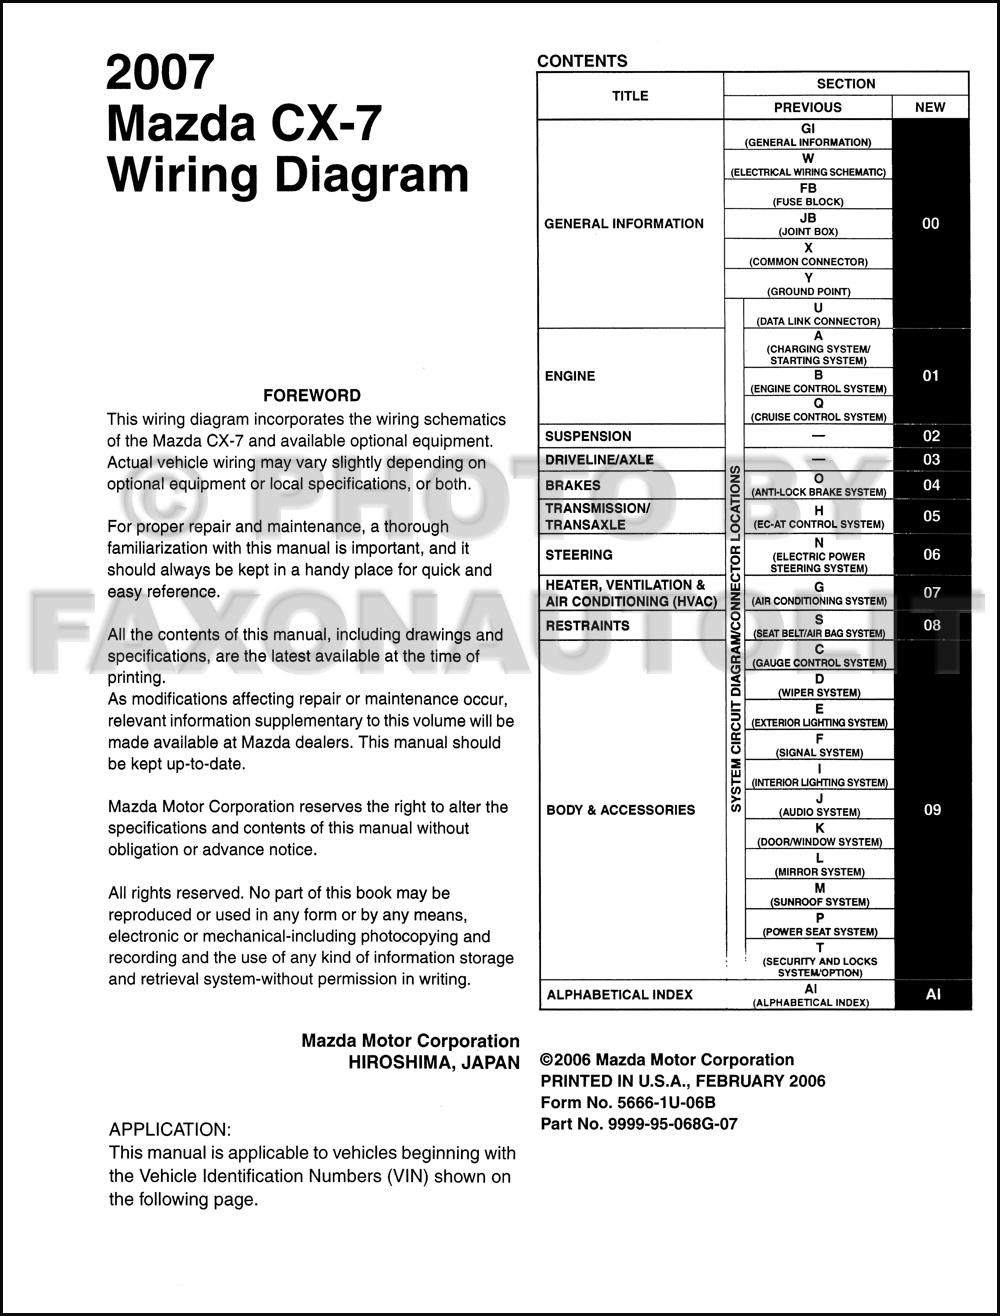 medium resolution of 2007 mazda cx 7 wiring diagram manual original mazda cx 7 audio wiring diagram